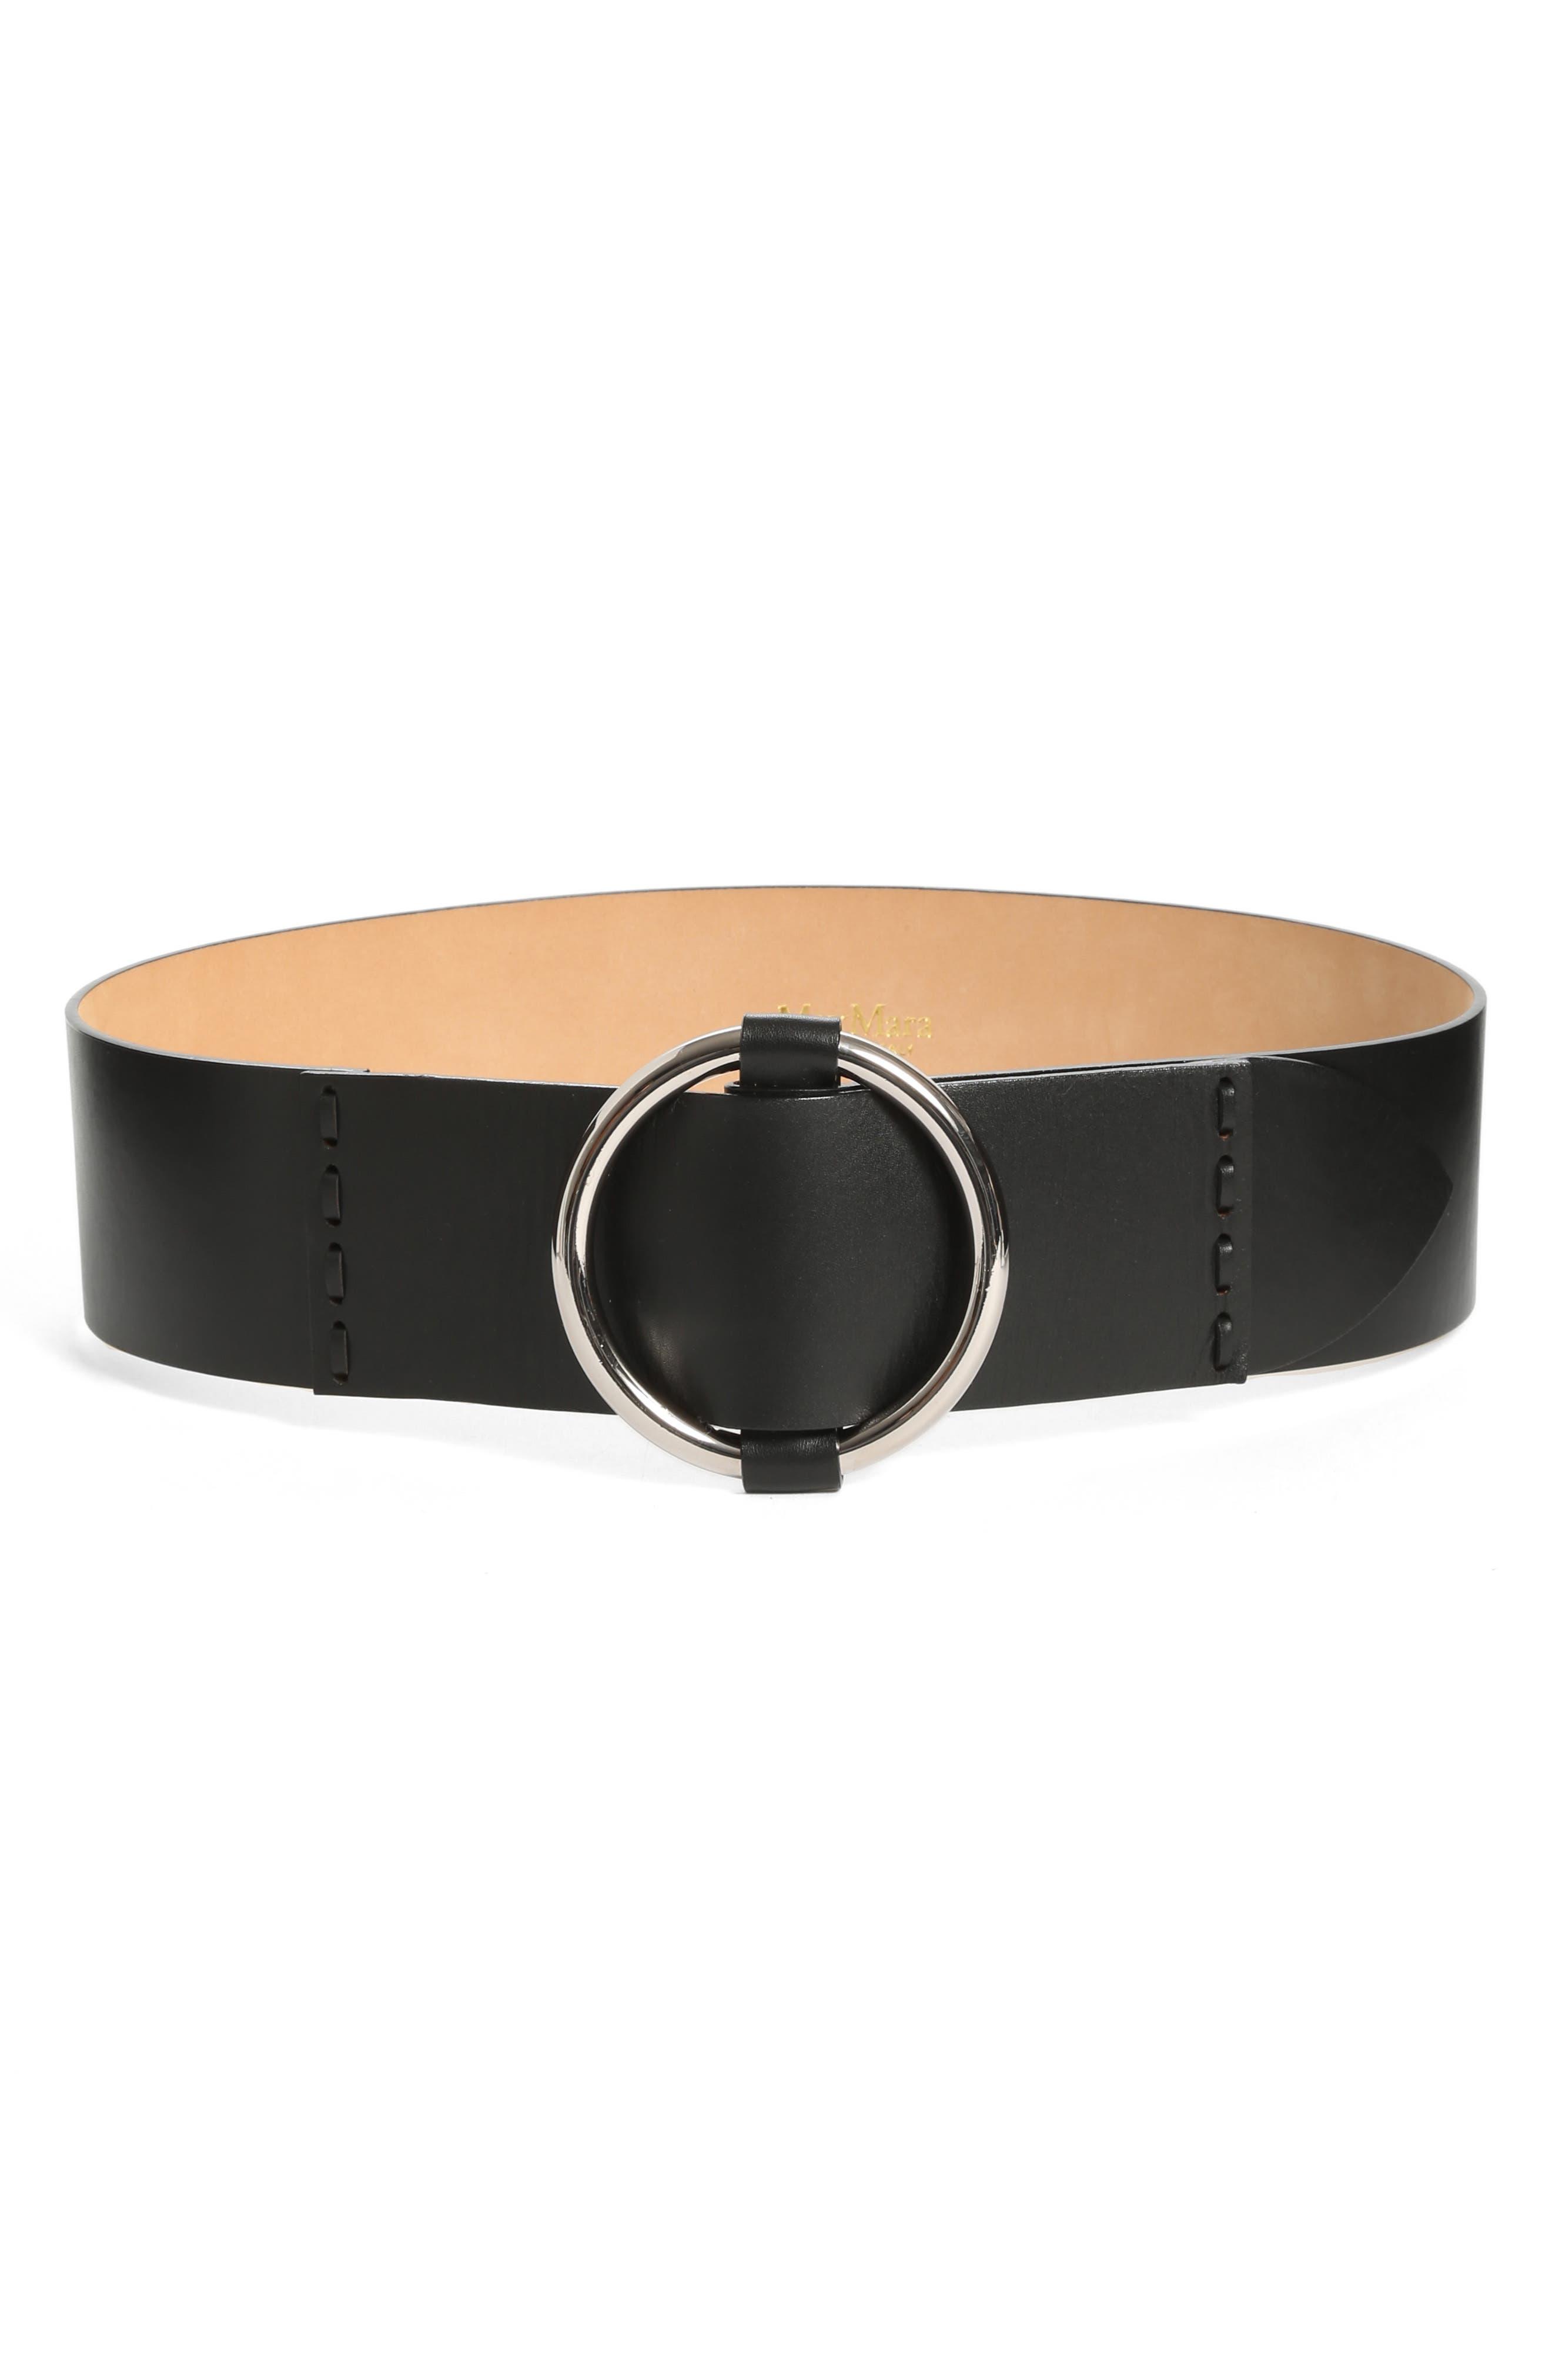 MAX MARA Curt Circle Buckle Leather Belt, Main, color, 001